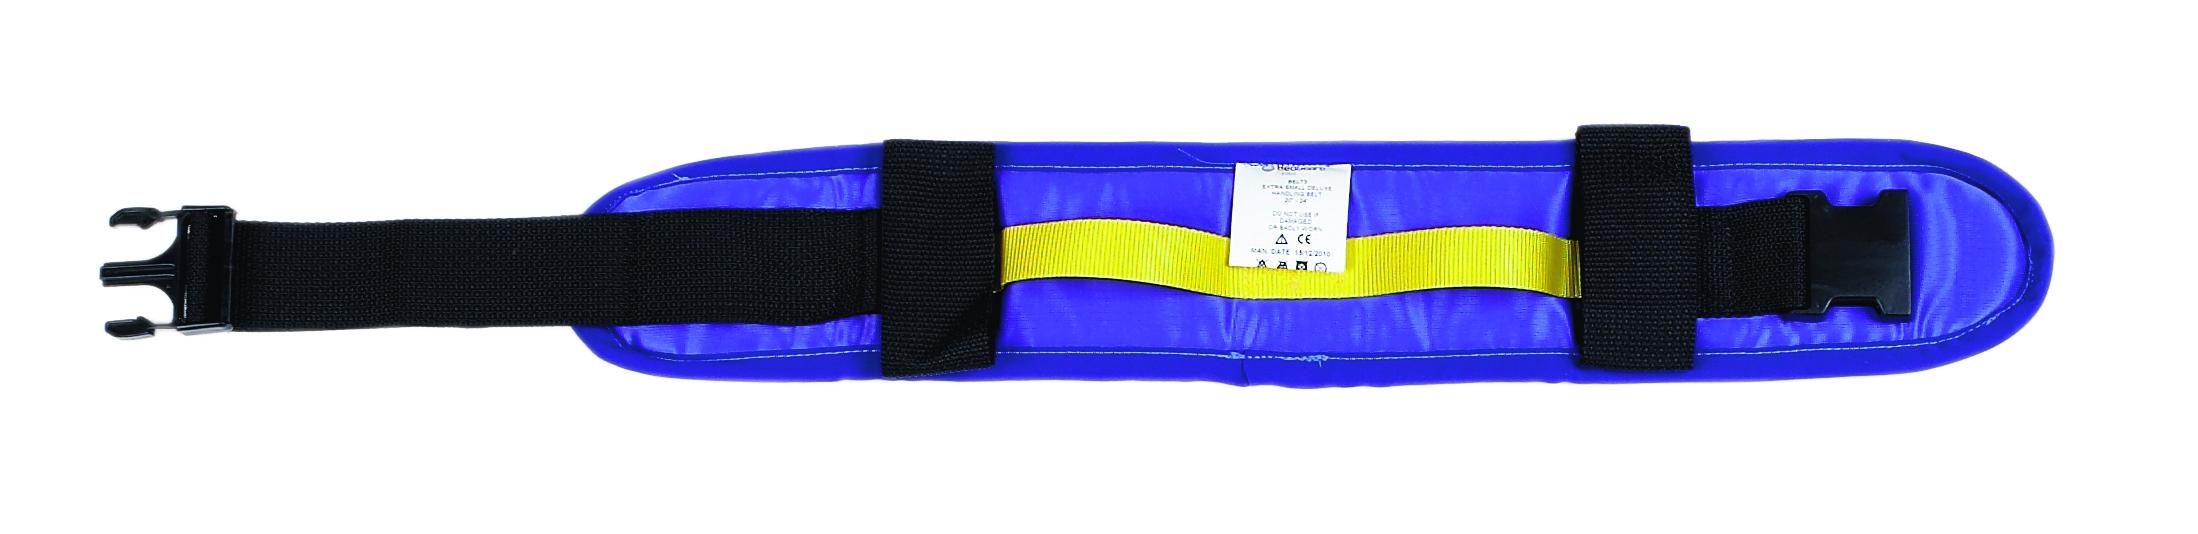 Extra Small Deluxe Handling Belt